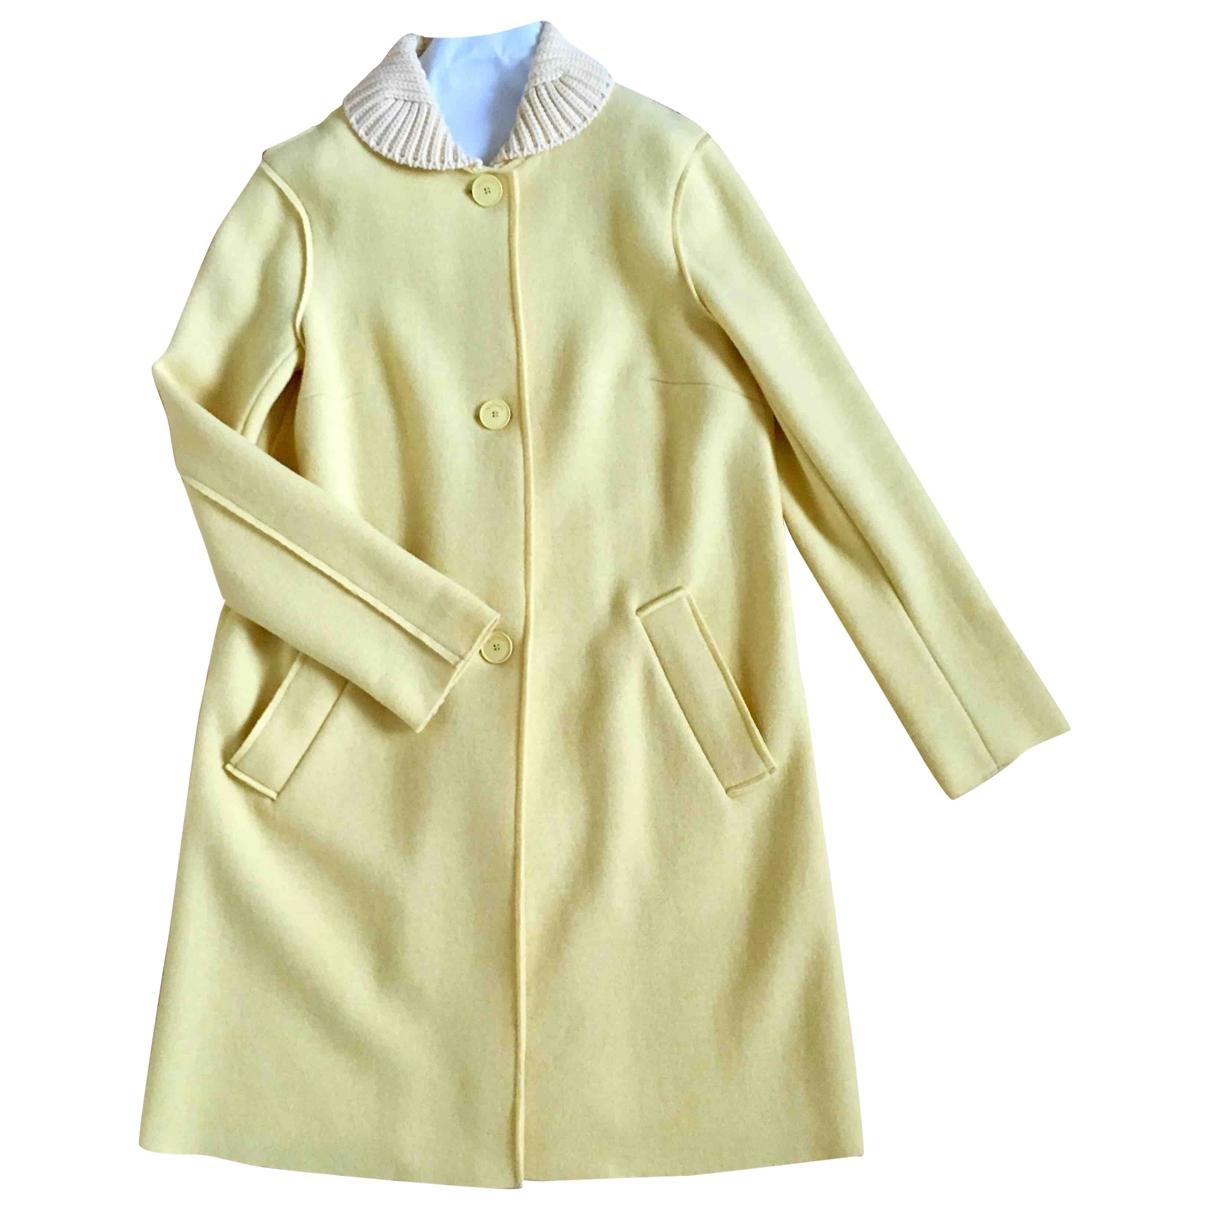 Max & Co \N Yellow Wool coat for Women S International